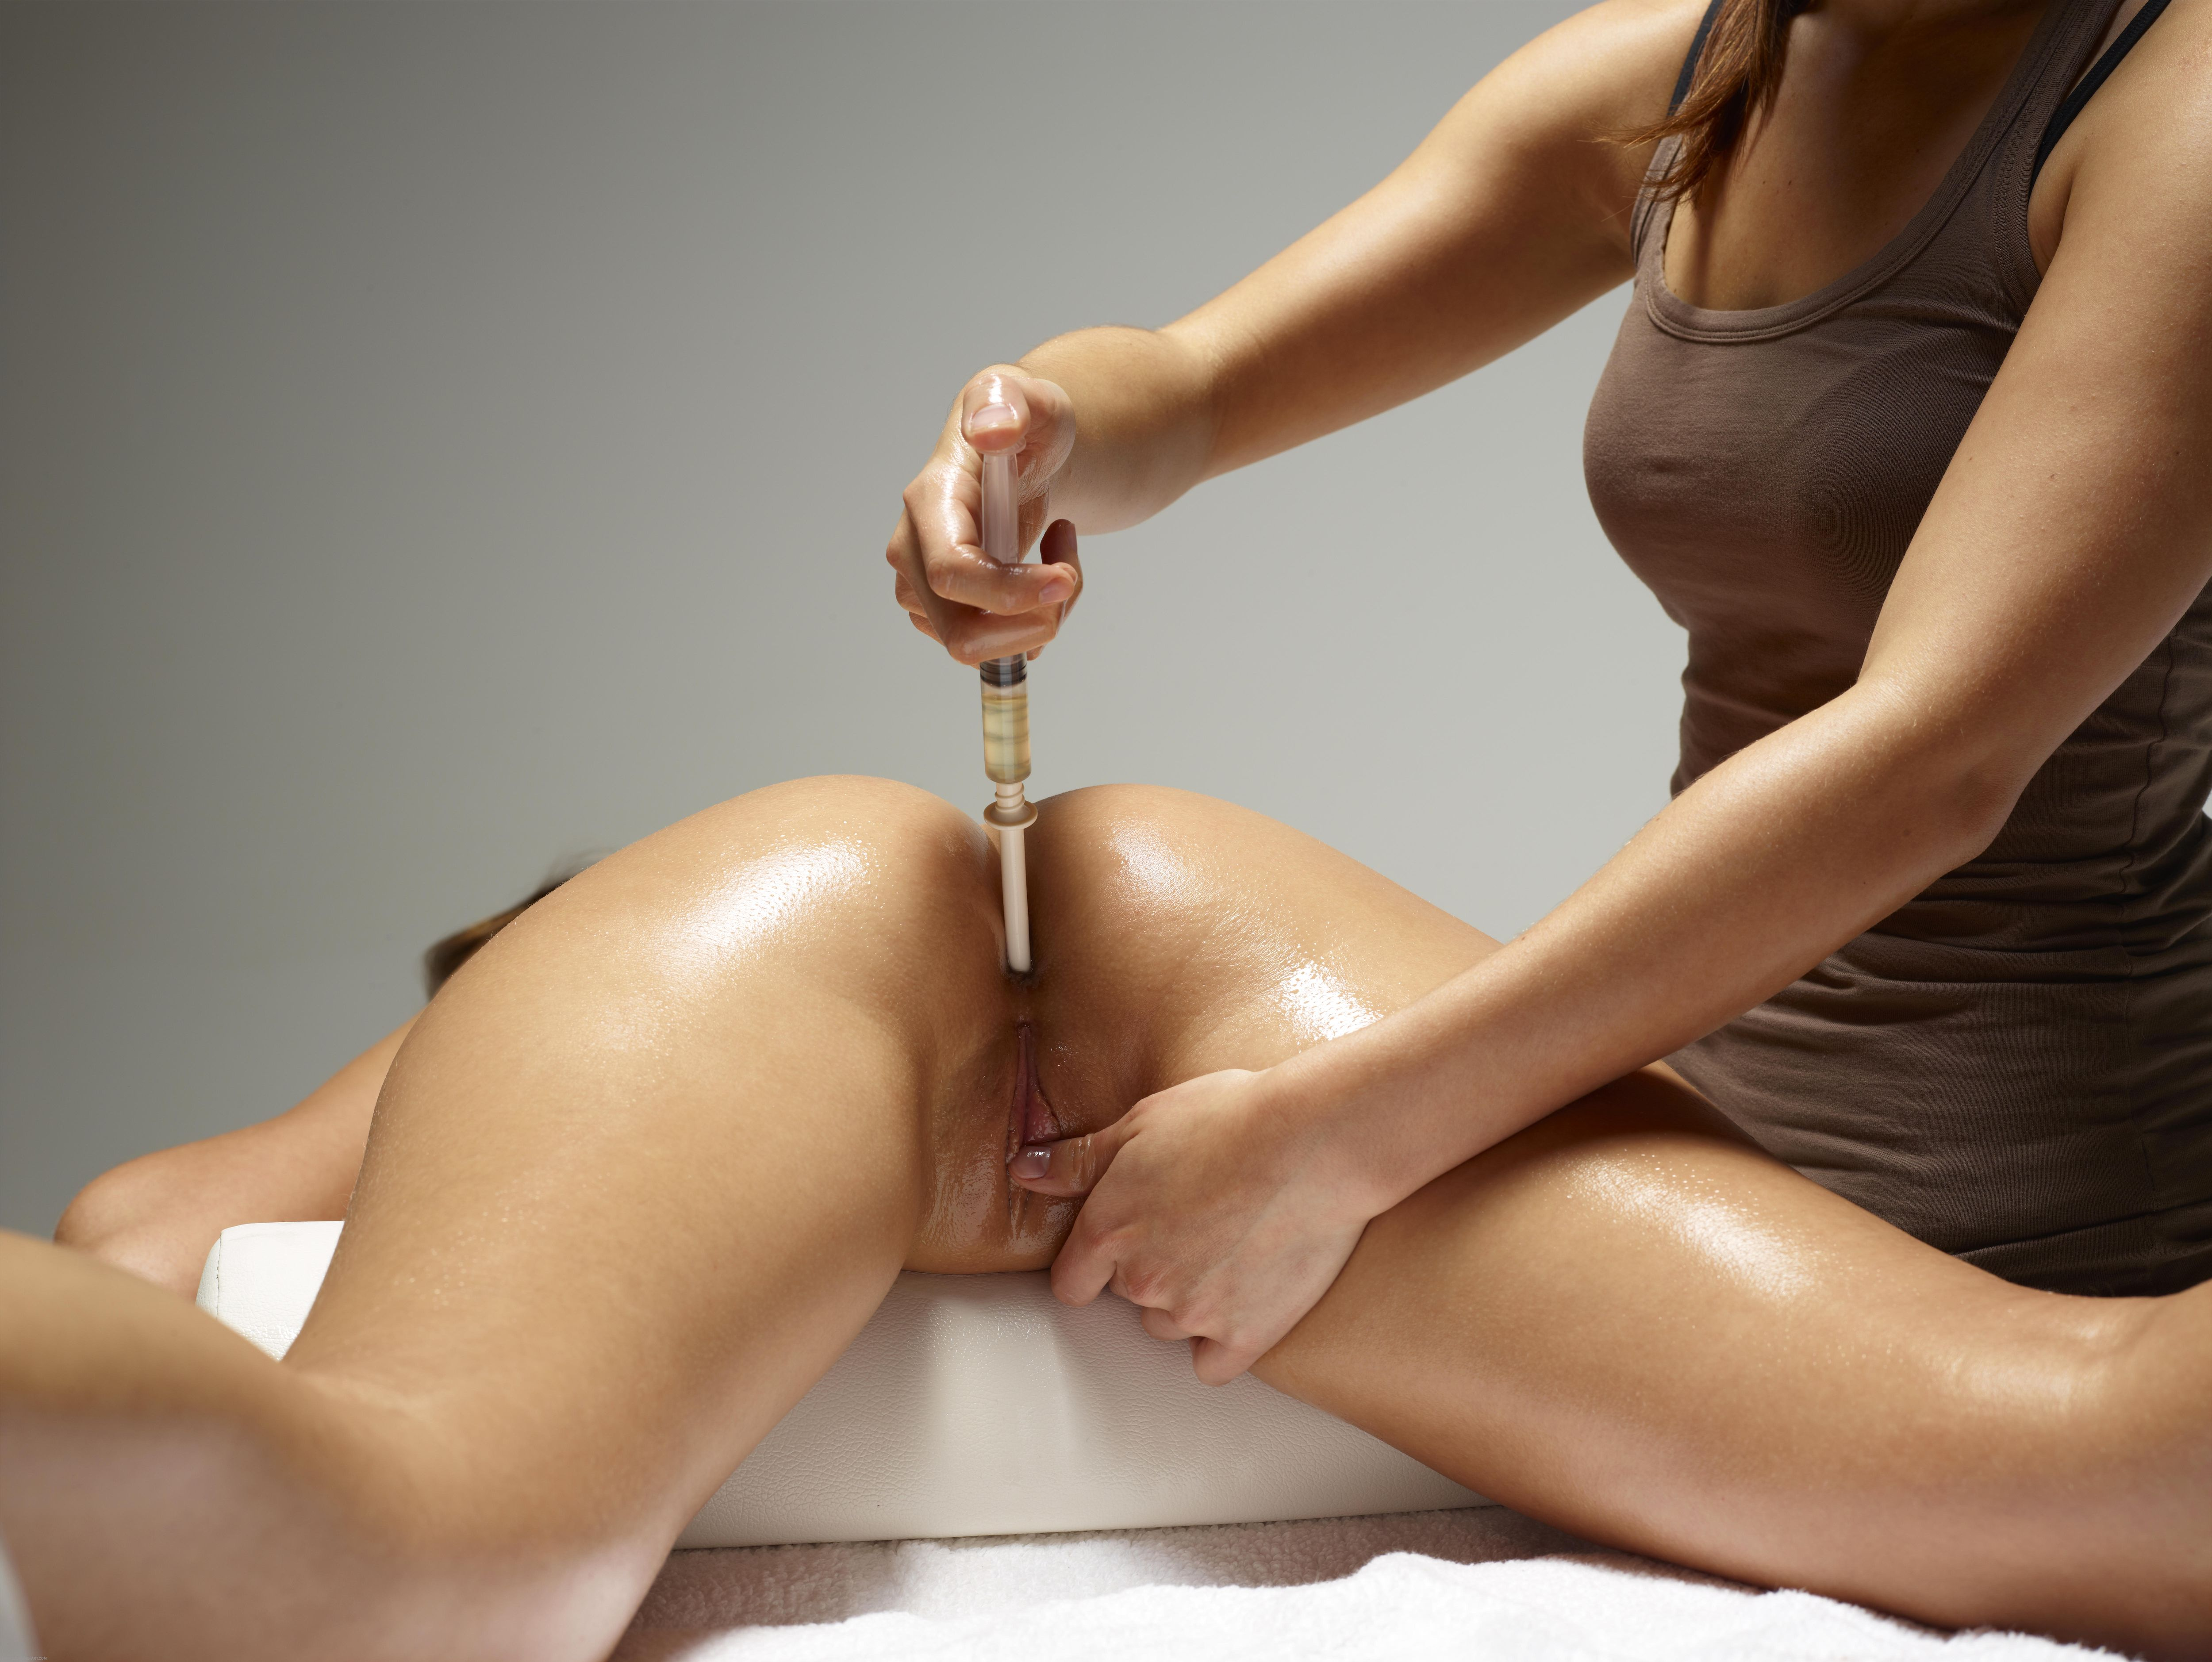 Теле эротика массаж 8 фотография